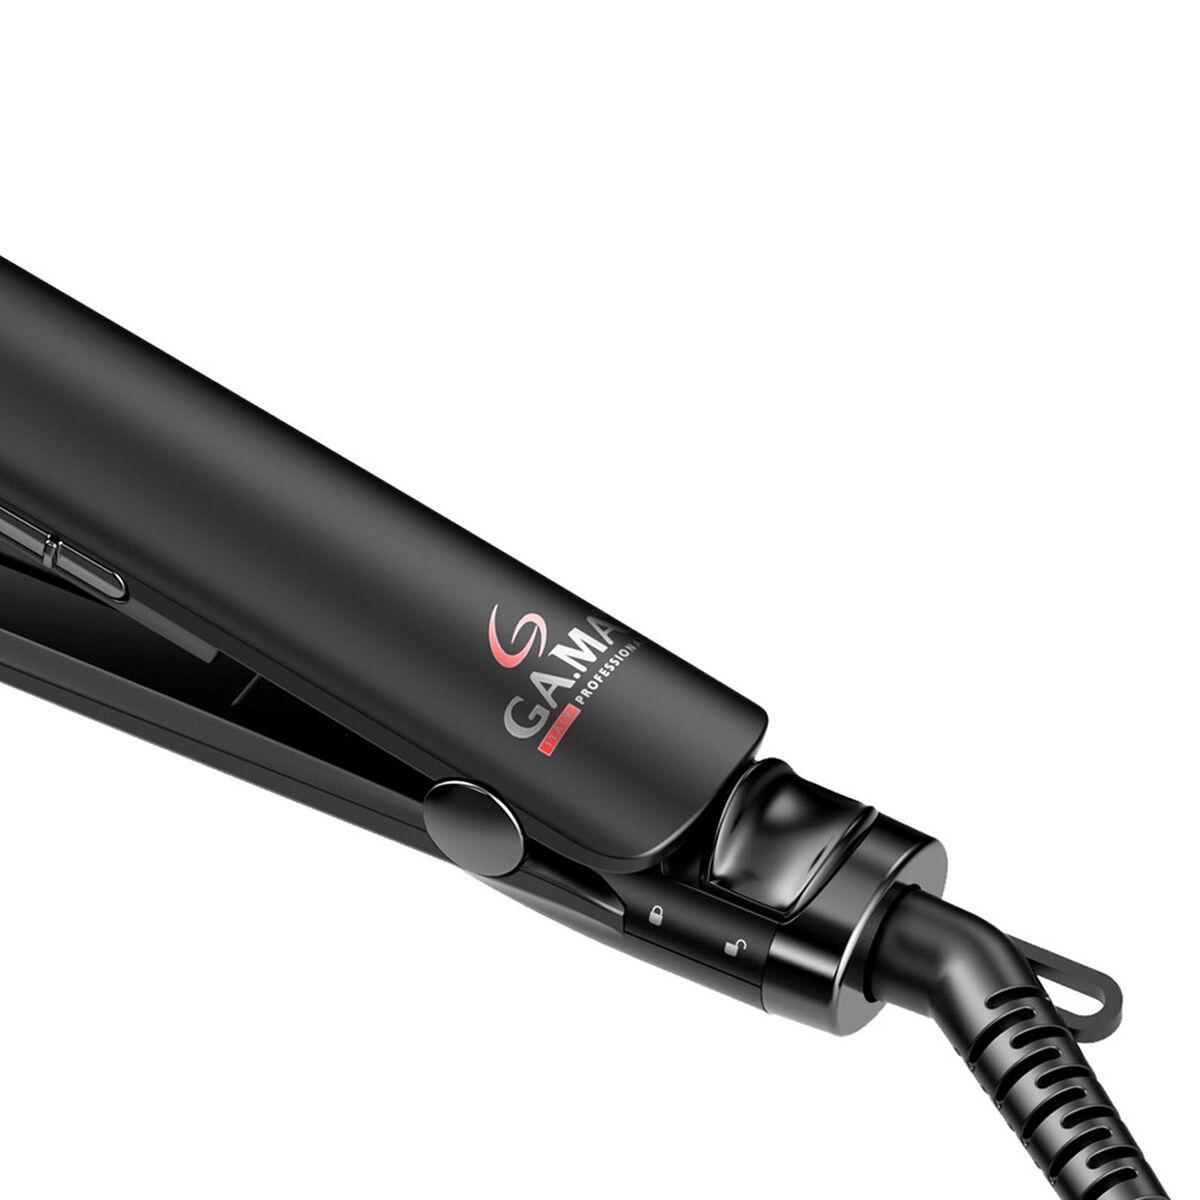 Combo Secador de Pelo Gama Mistral STD + Alisador Gama Elegance Bella STD + Ondulador Gama Turmalina 19 mm.